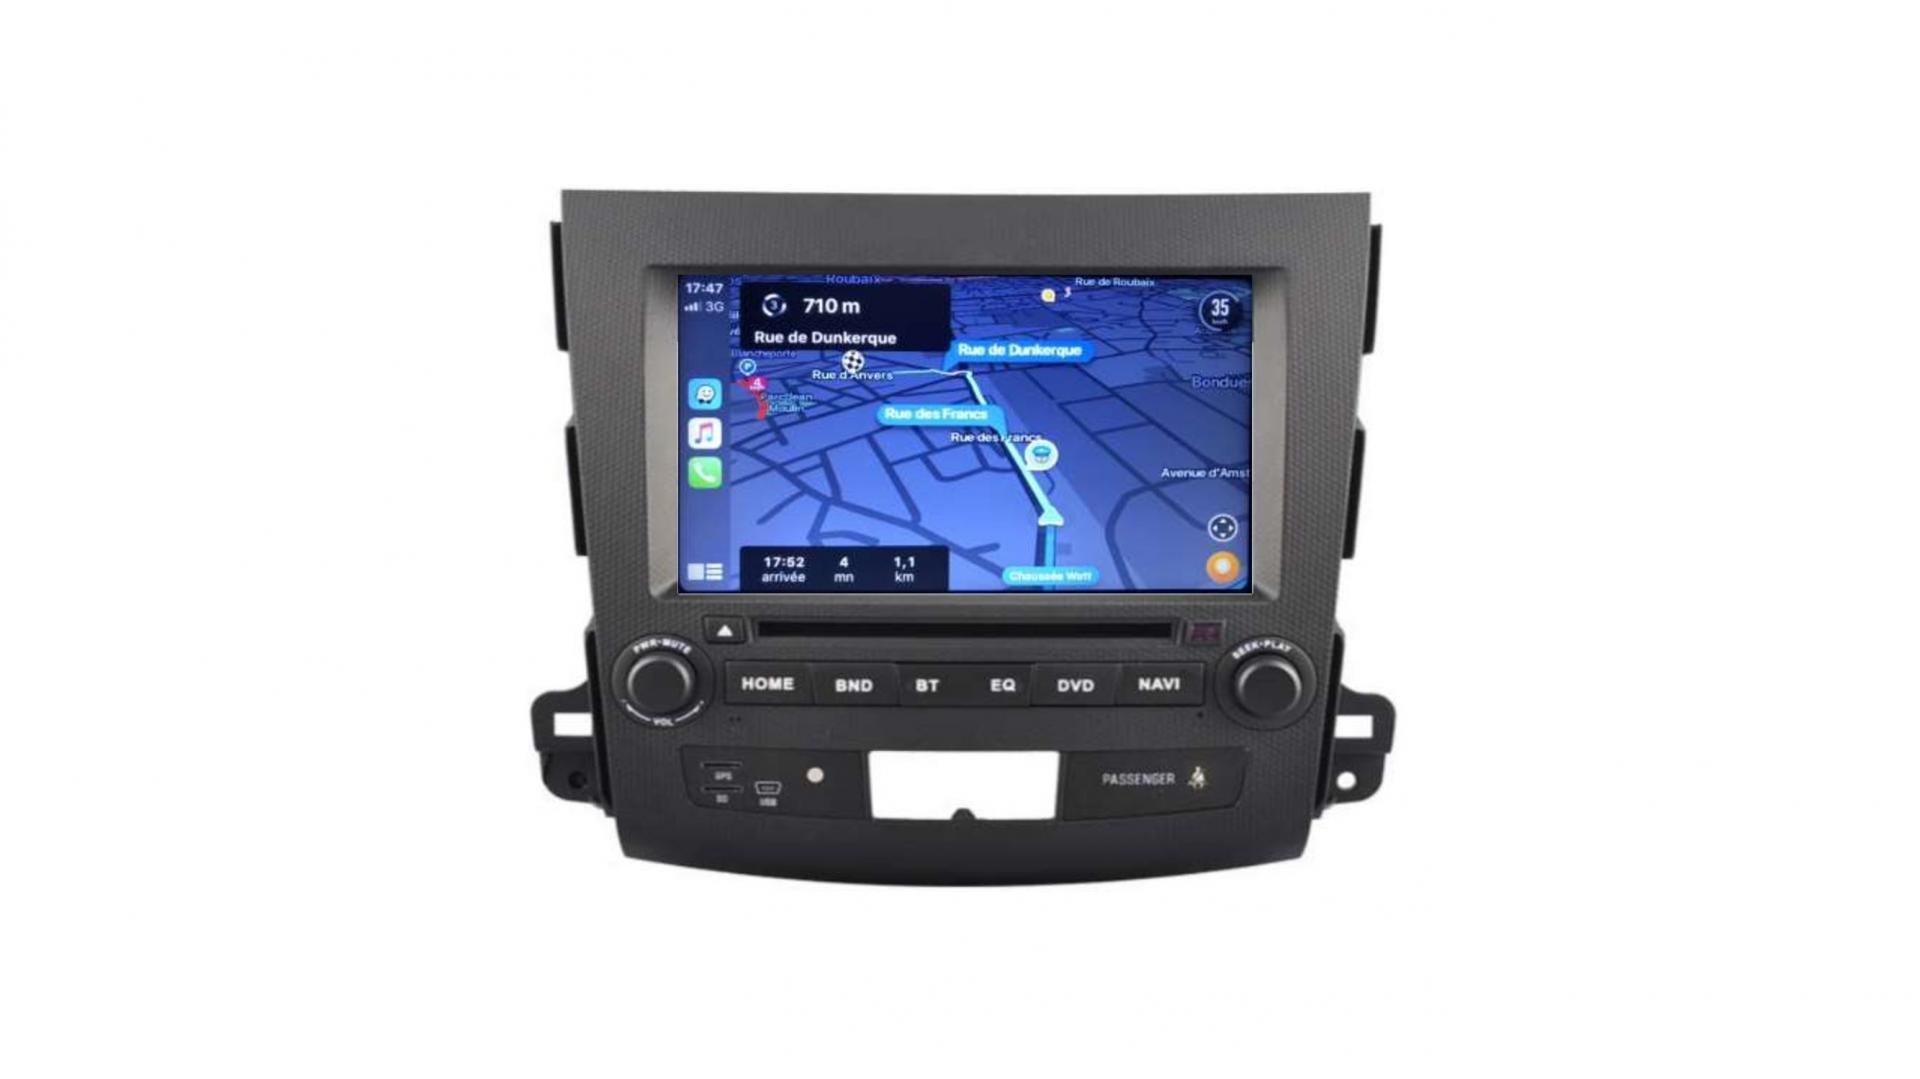 Autoradio gps bluetooth mitsubishi outlander asx android auto carplay camera de recul commande au volant3